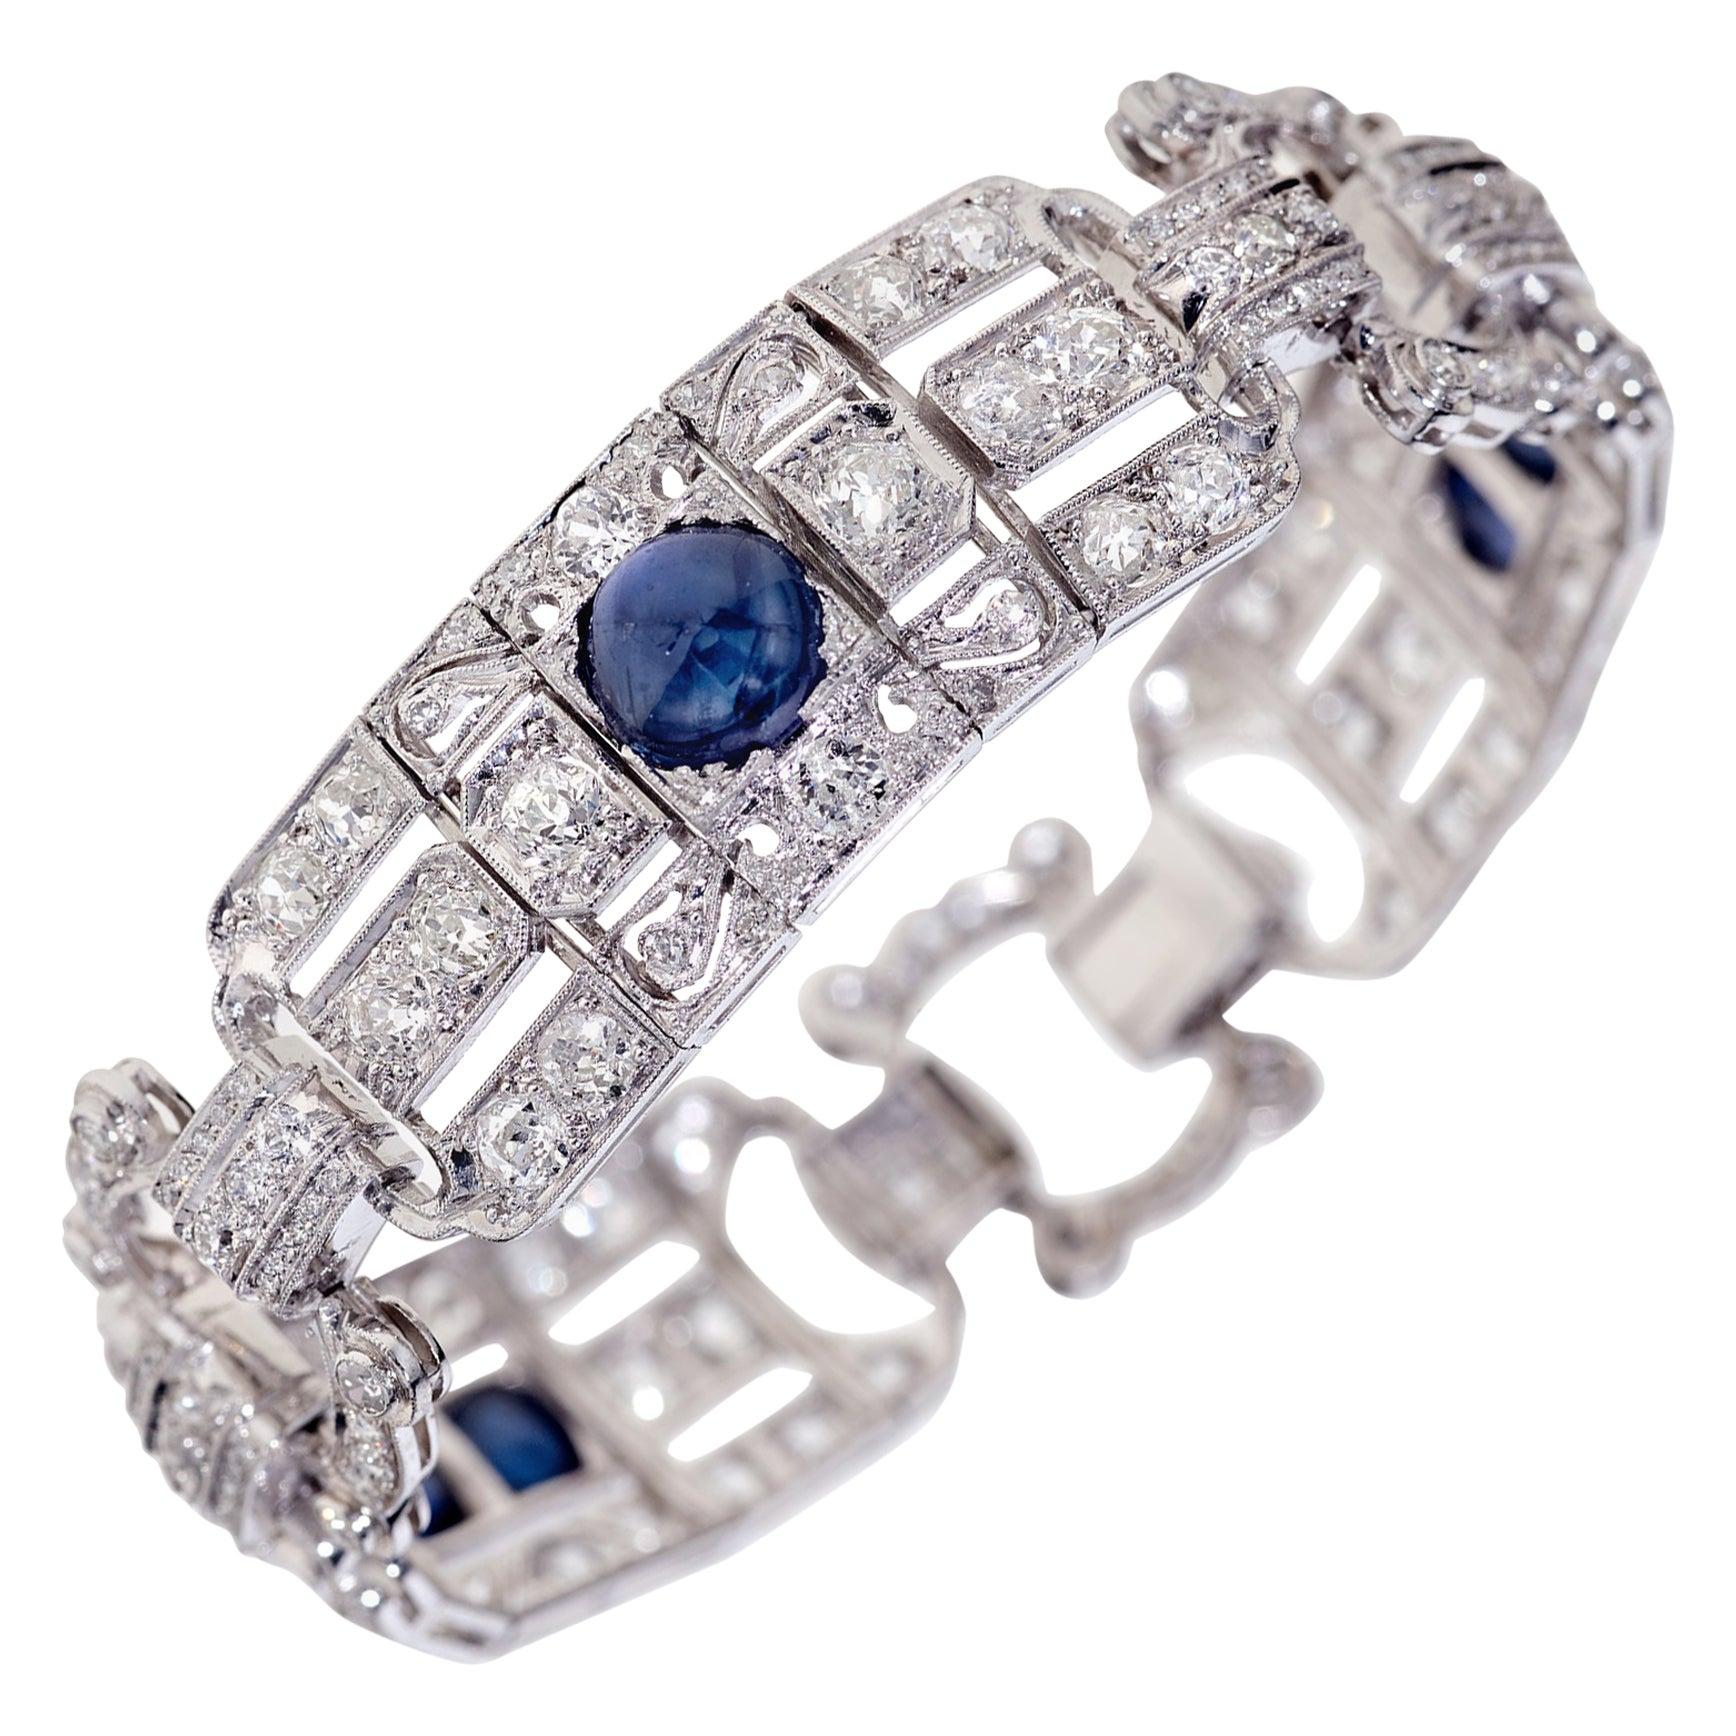 15.25 Carat Sapphire and Diamond Art Deco Bracelet in Platinum